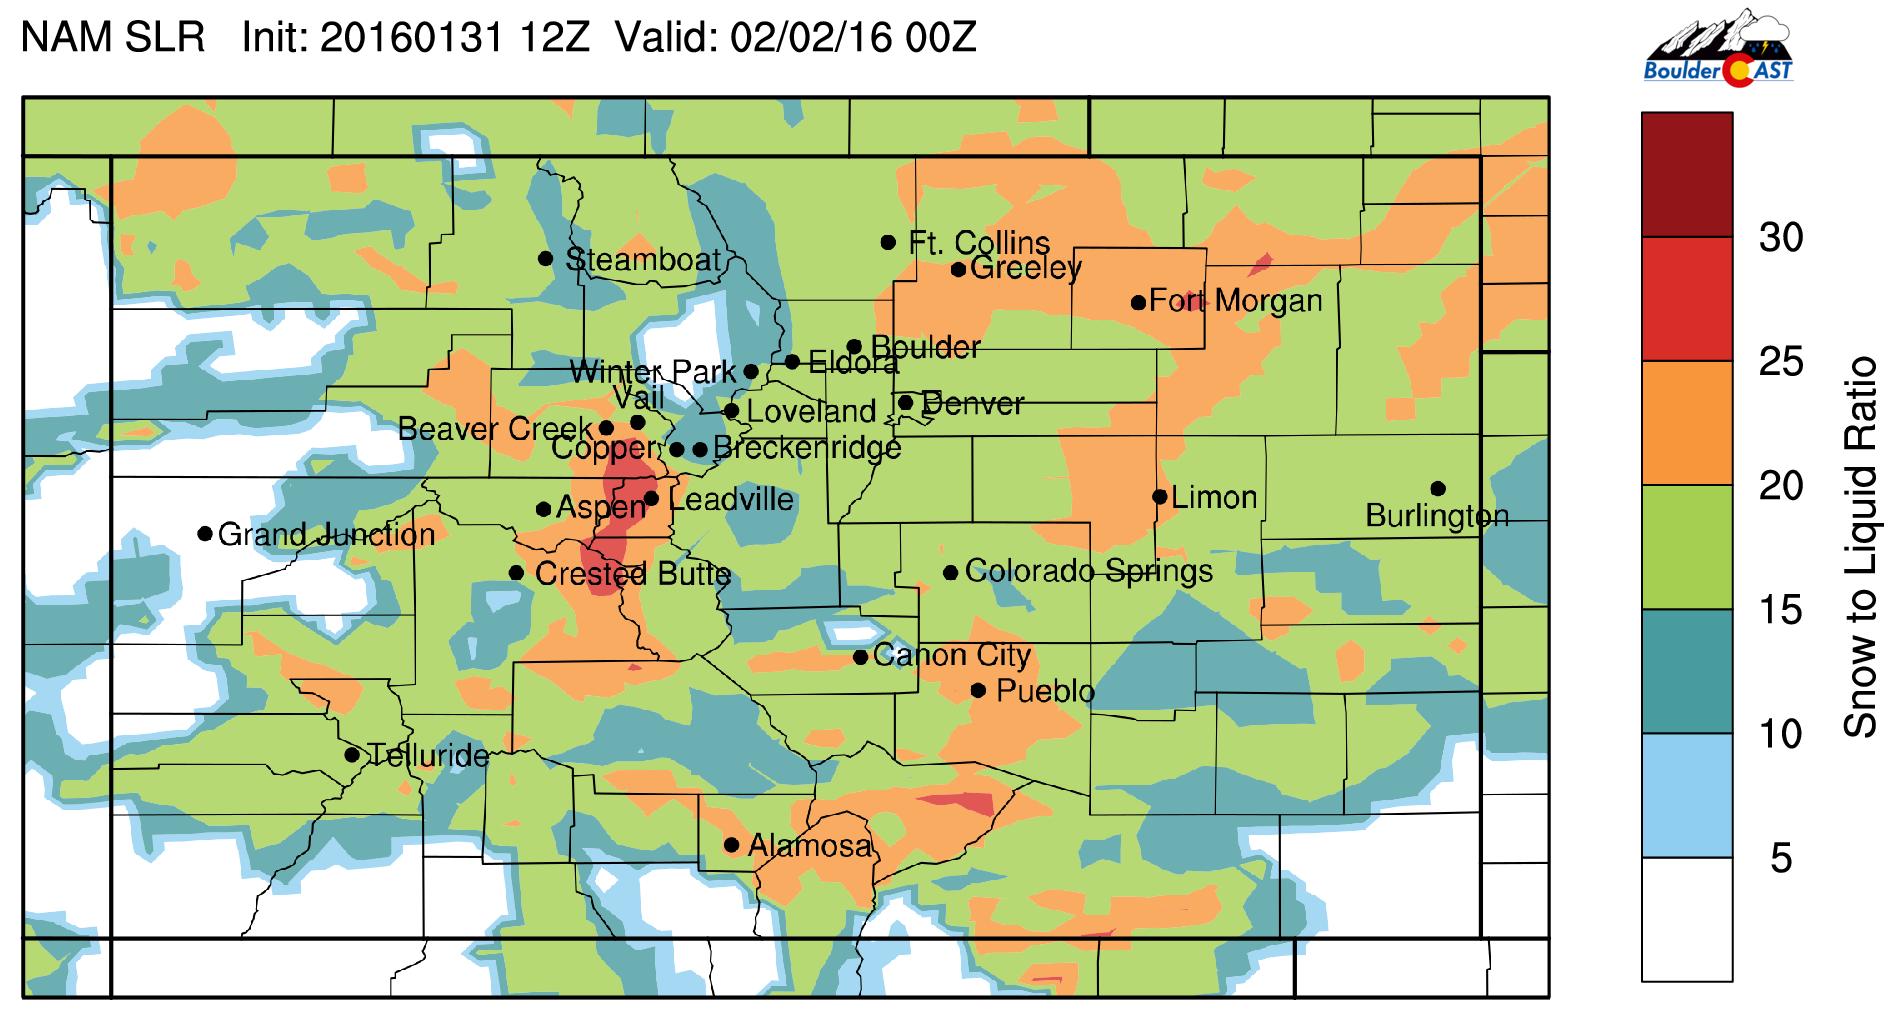 BoulderCAST snow liquid ratio forecast for Monday evening, derived from NAM model output